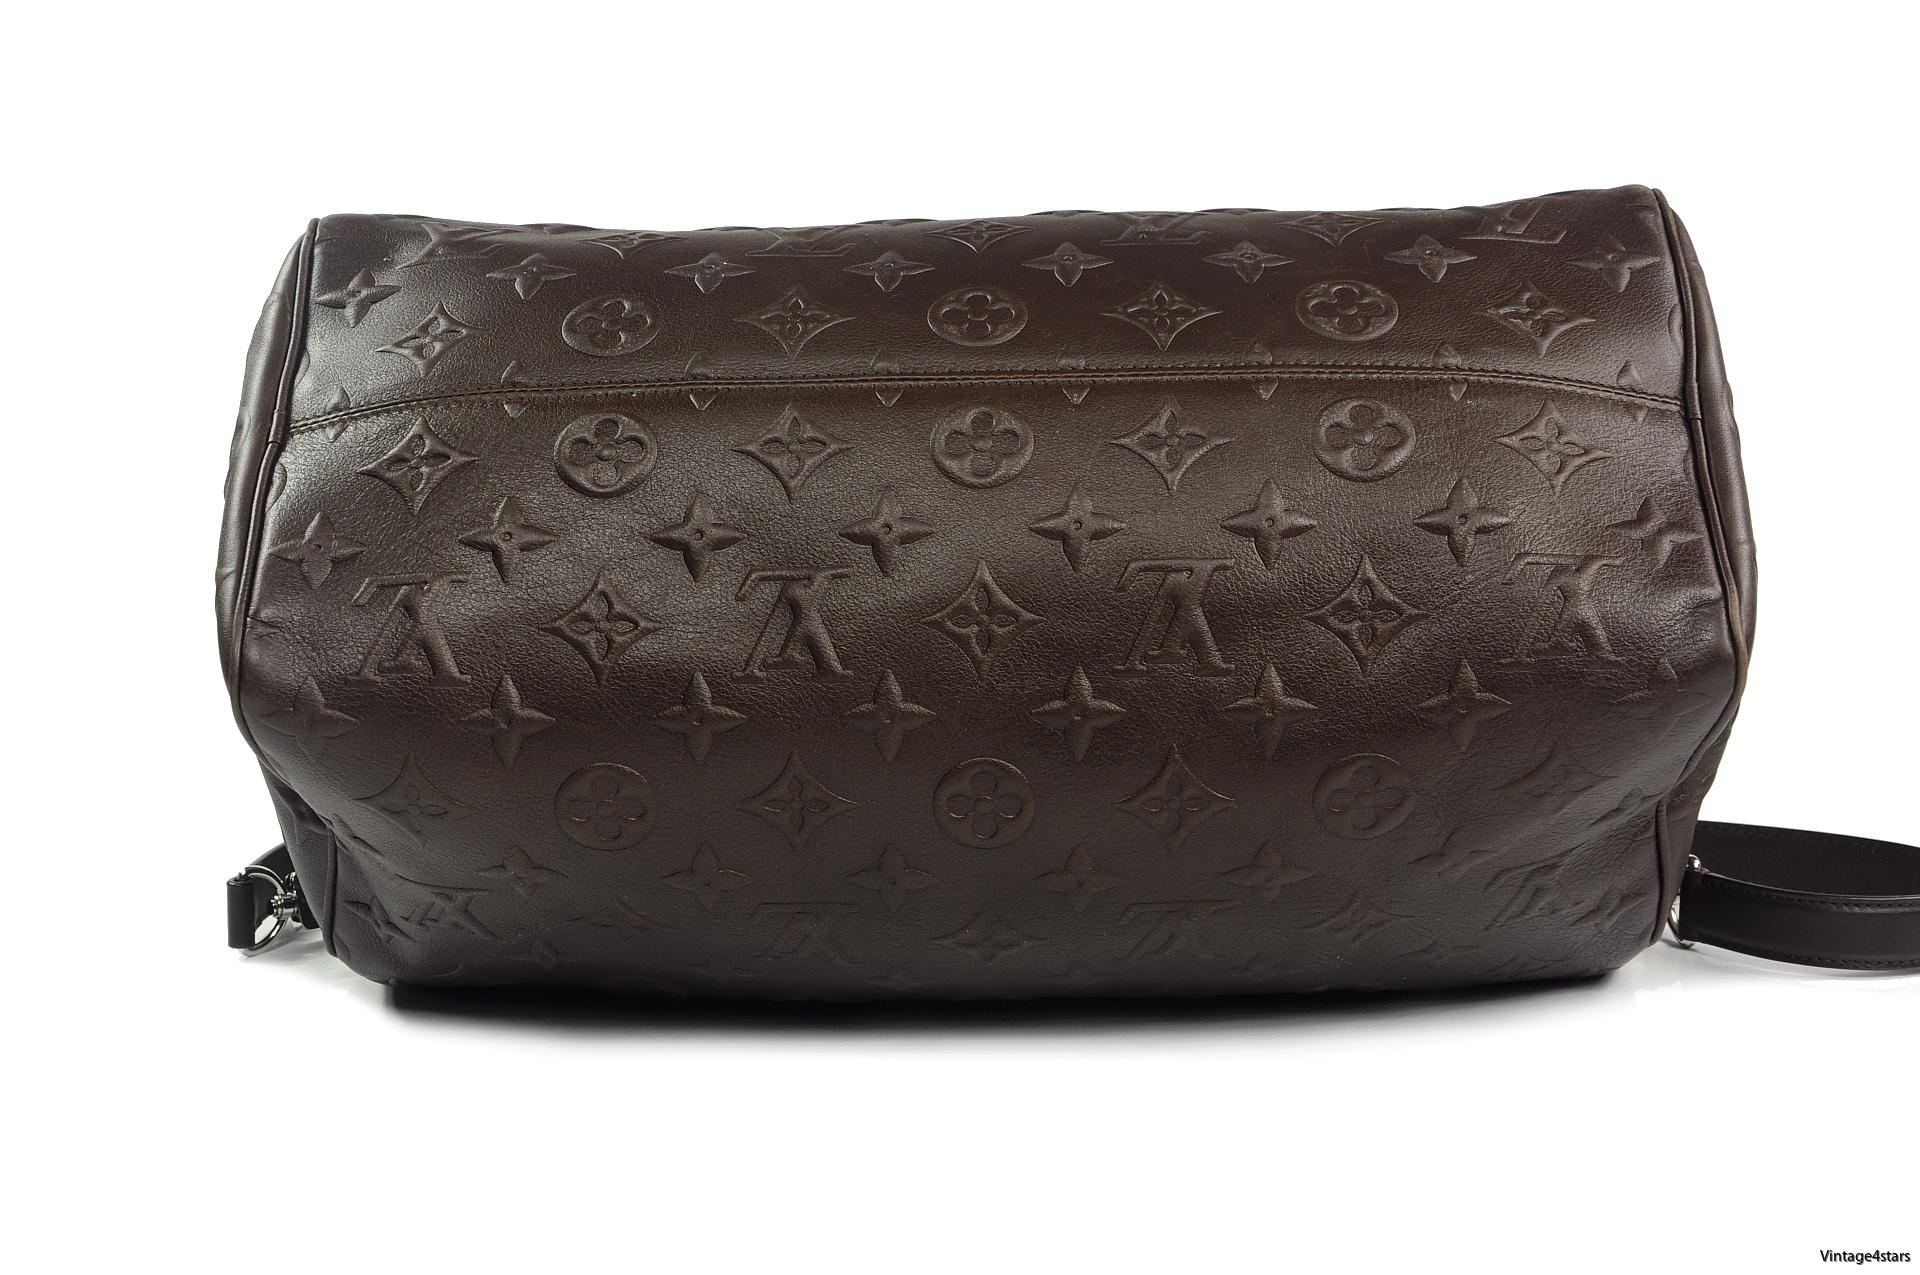 Louis Vuitton Keepall Edun 5-2